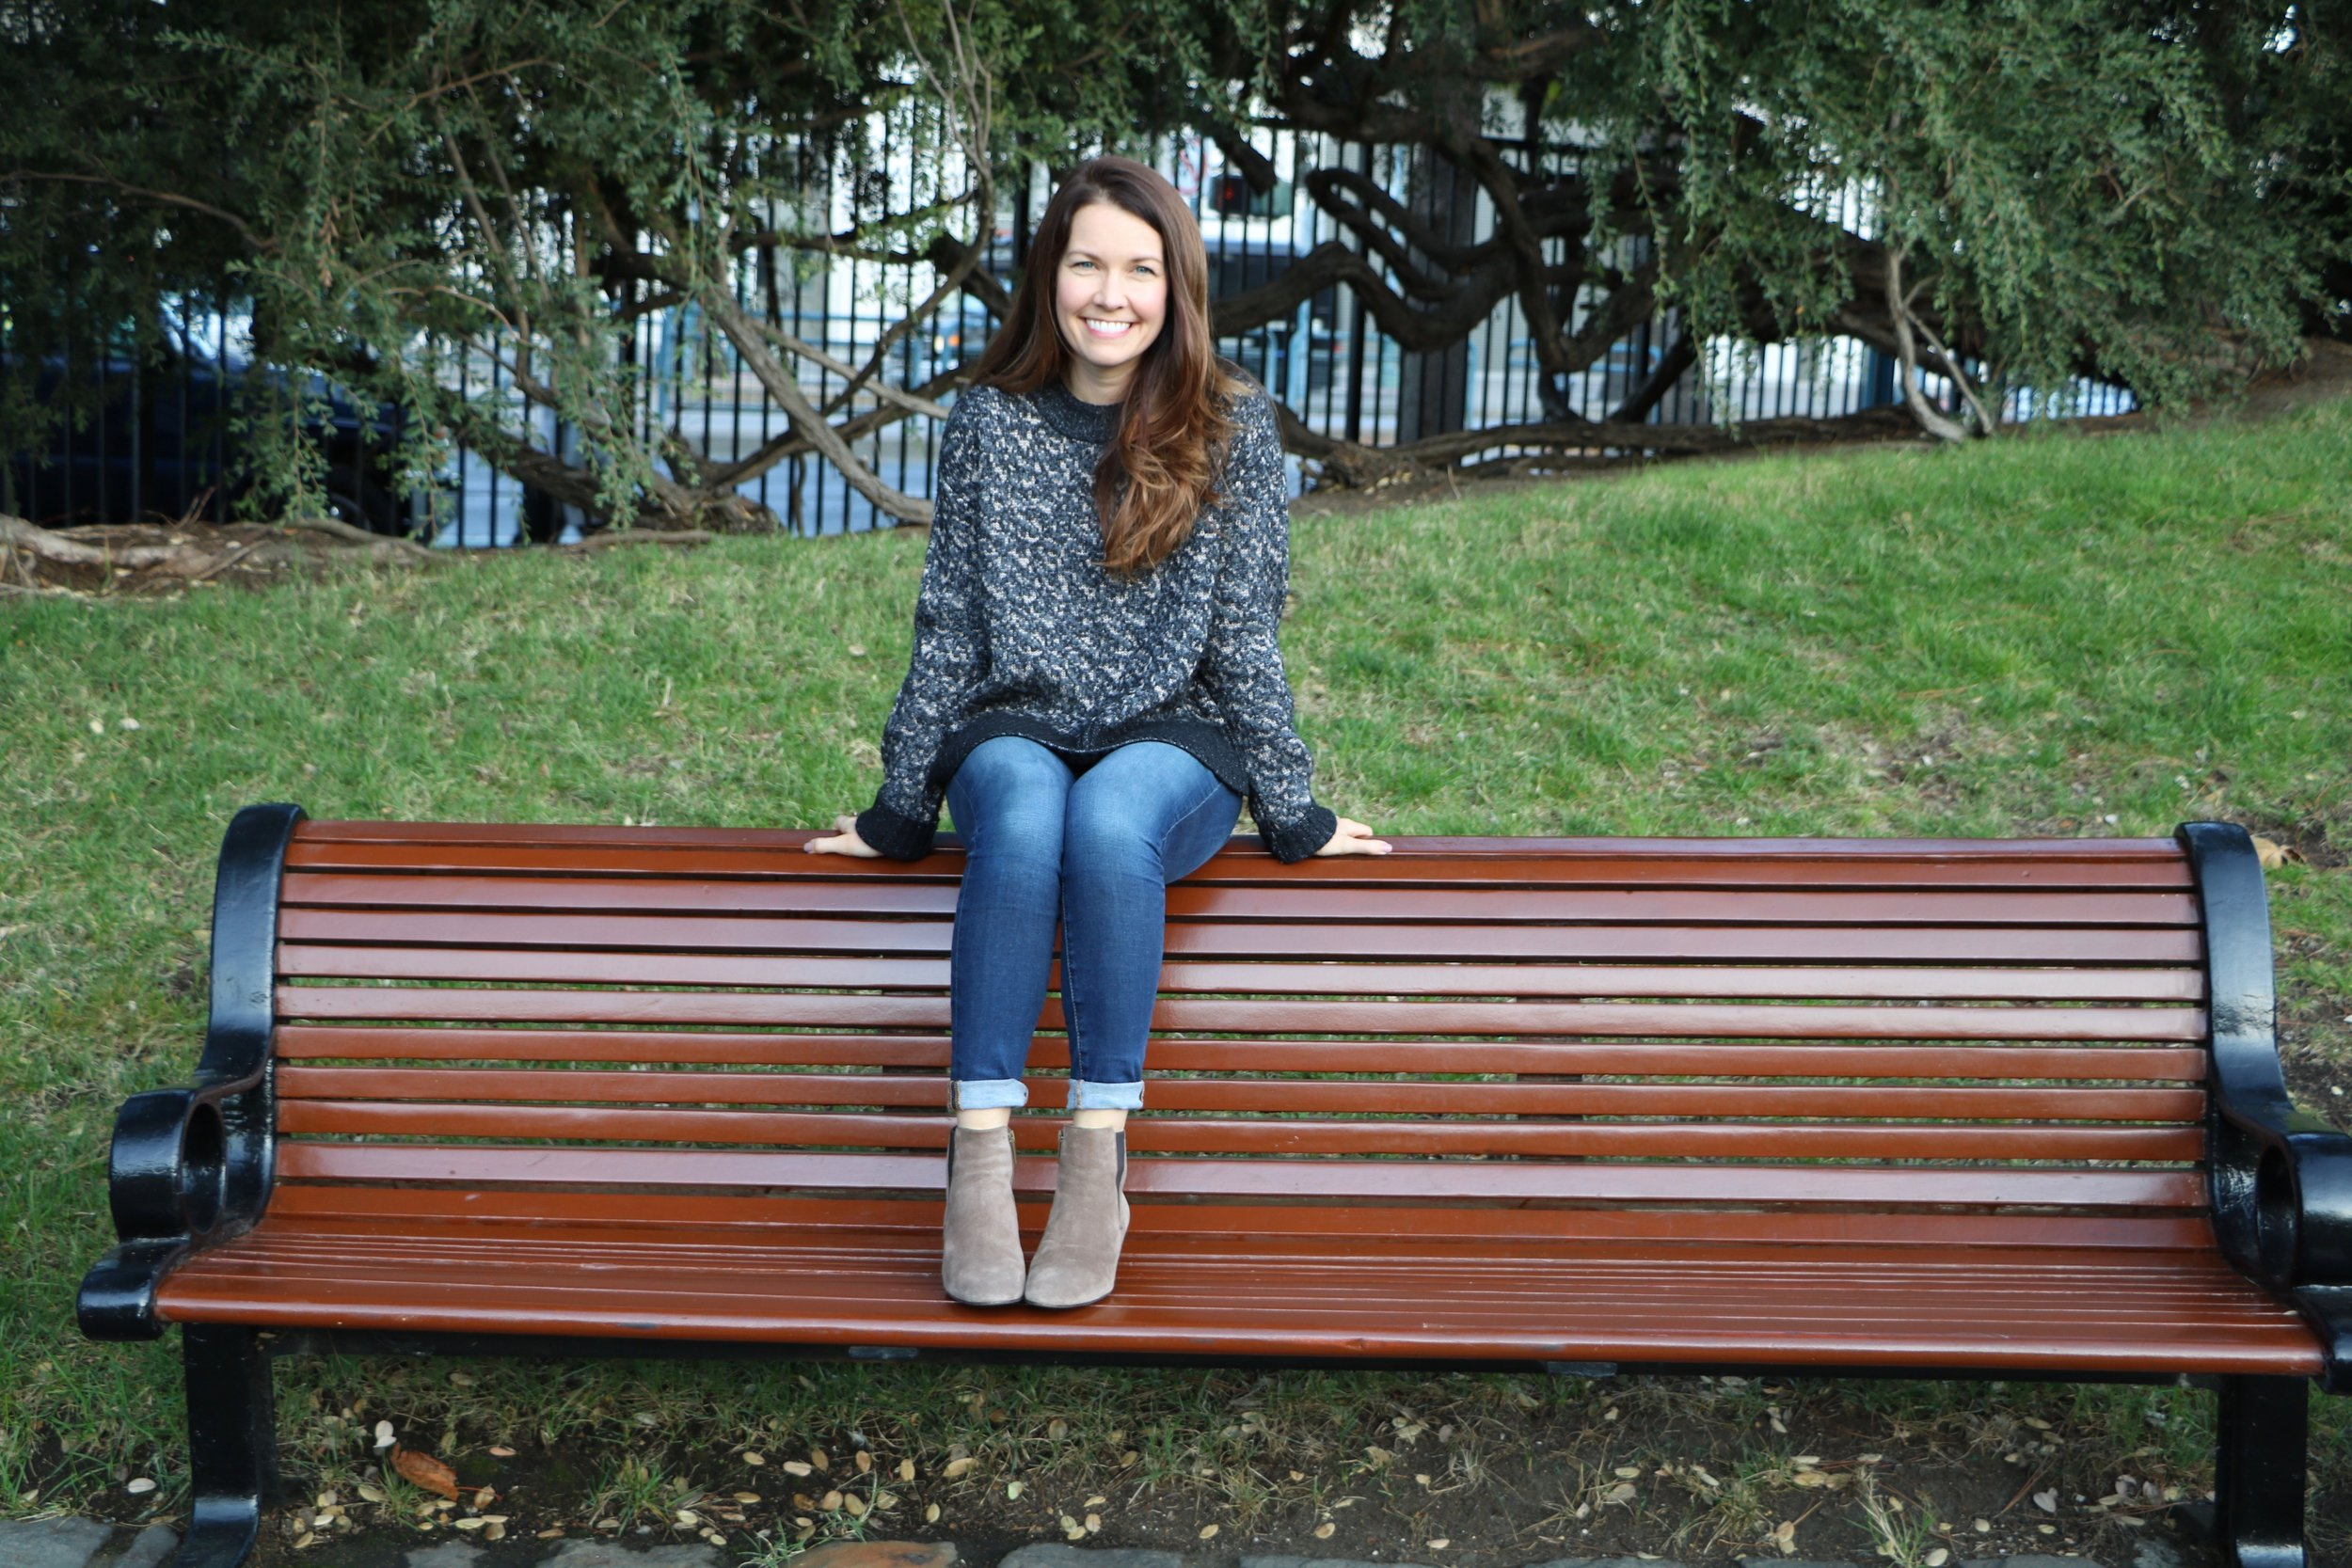 kimberly_winter_sweater_bench